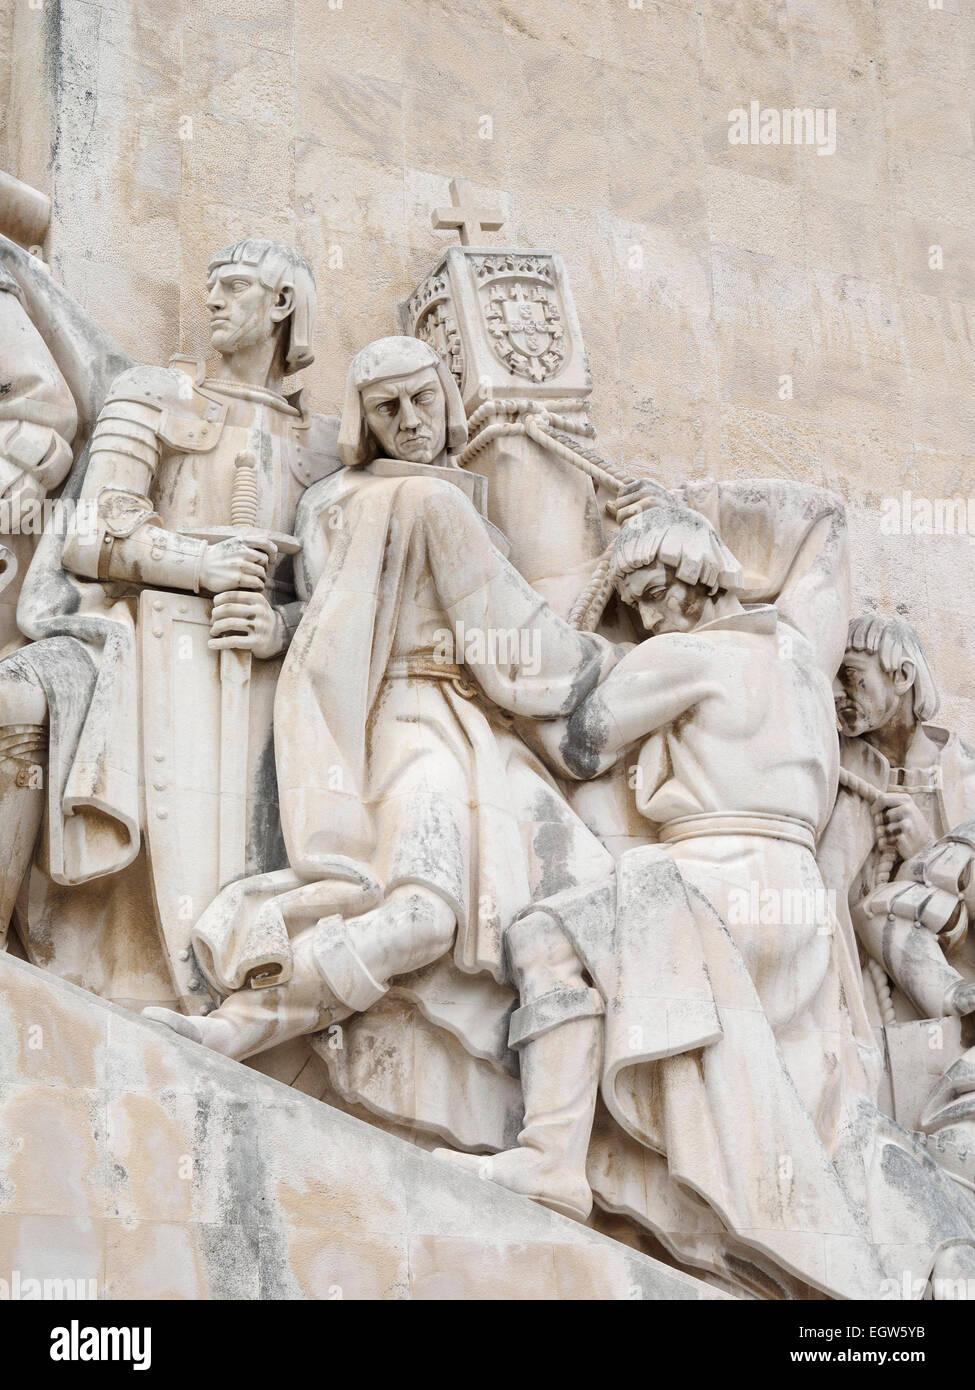 Detail of the statues The Padrão dos Descobrimentos in Belém, Lisbon, Portugal - Stock Image